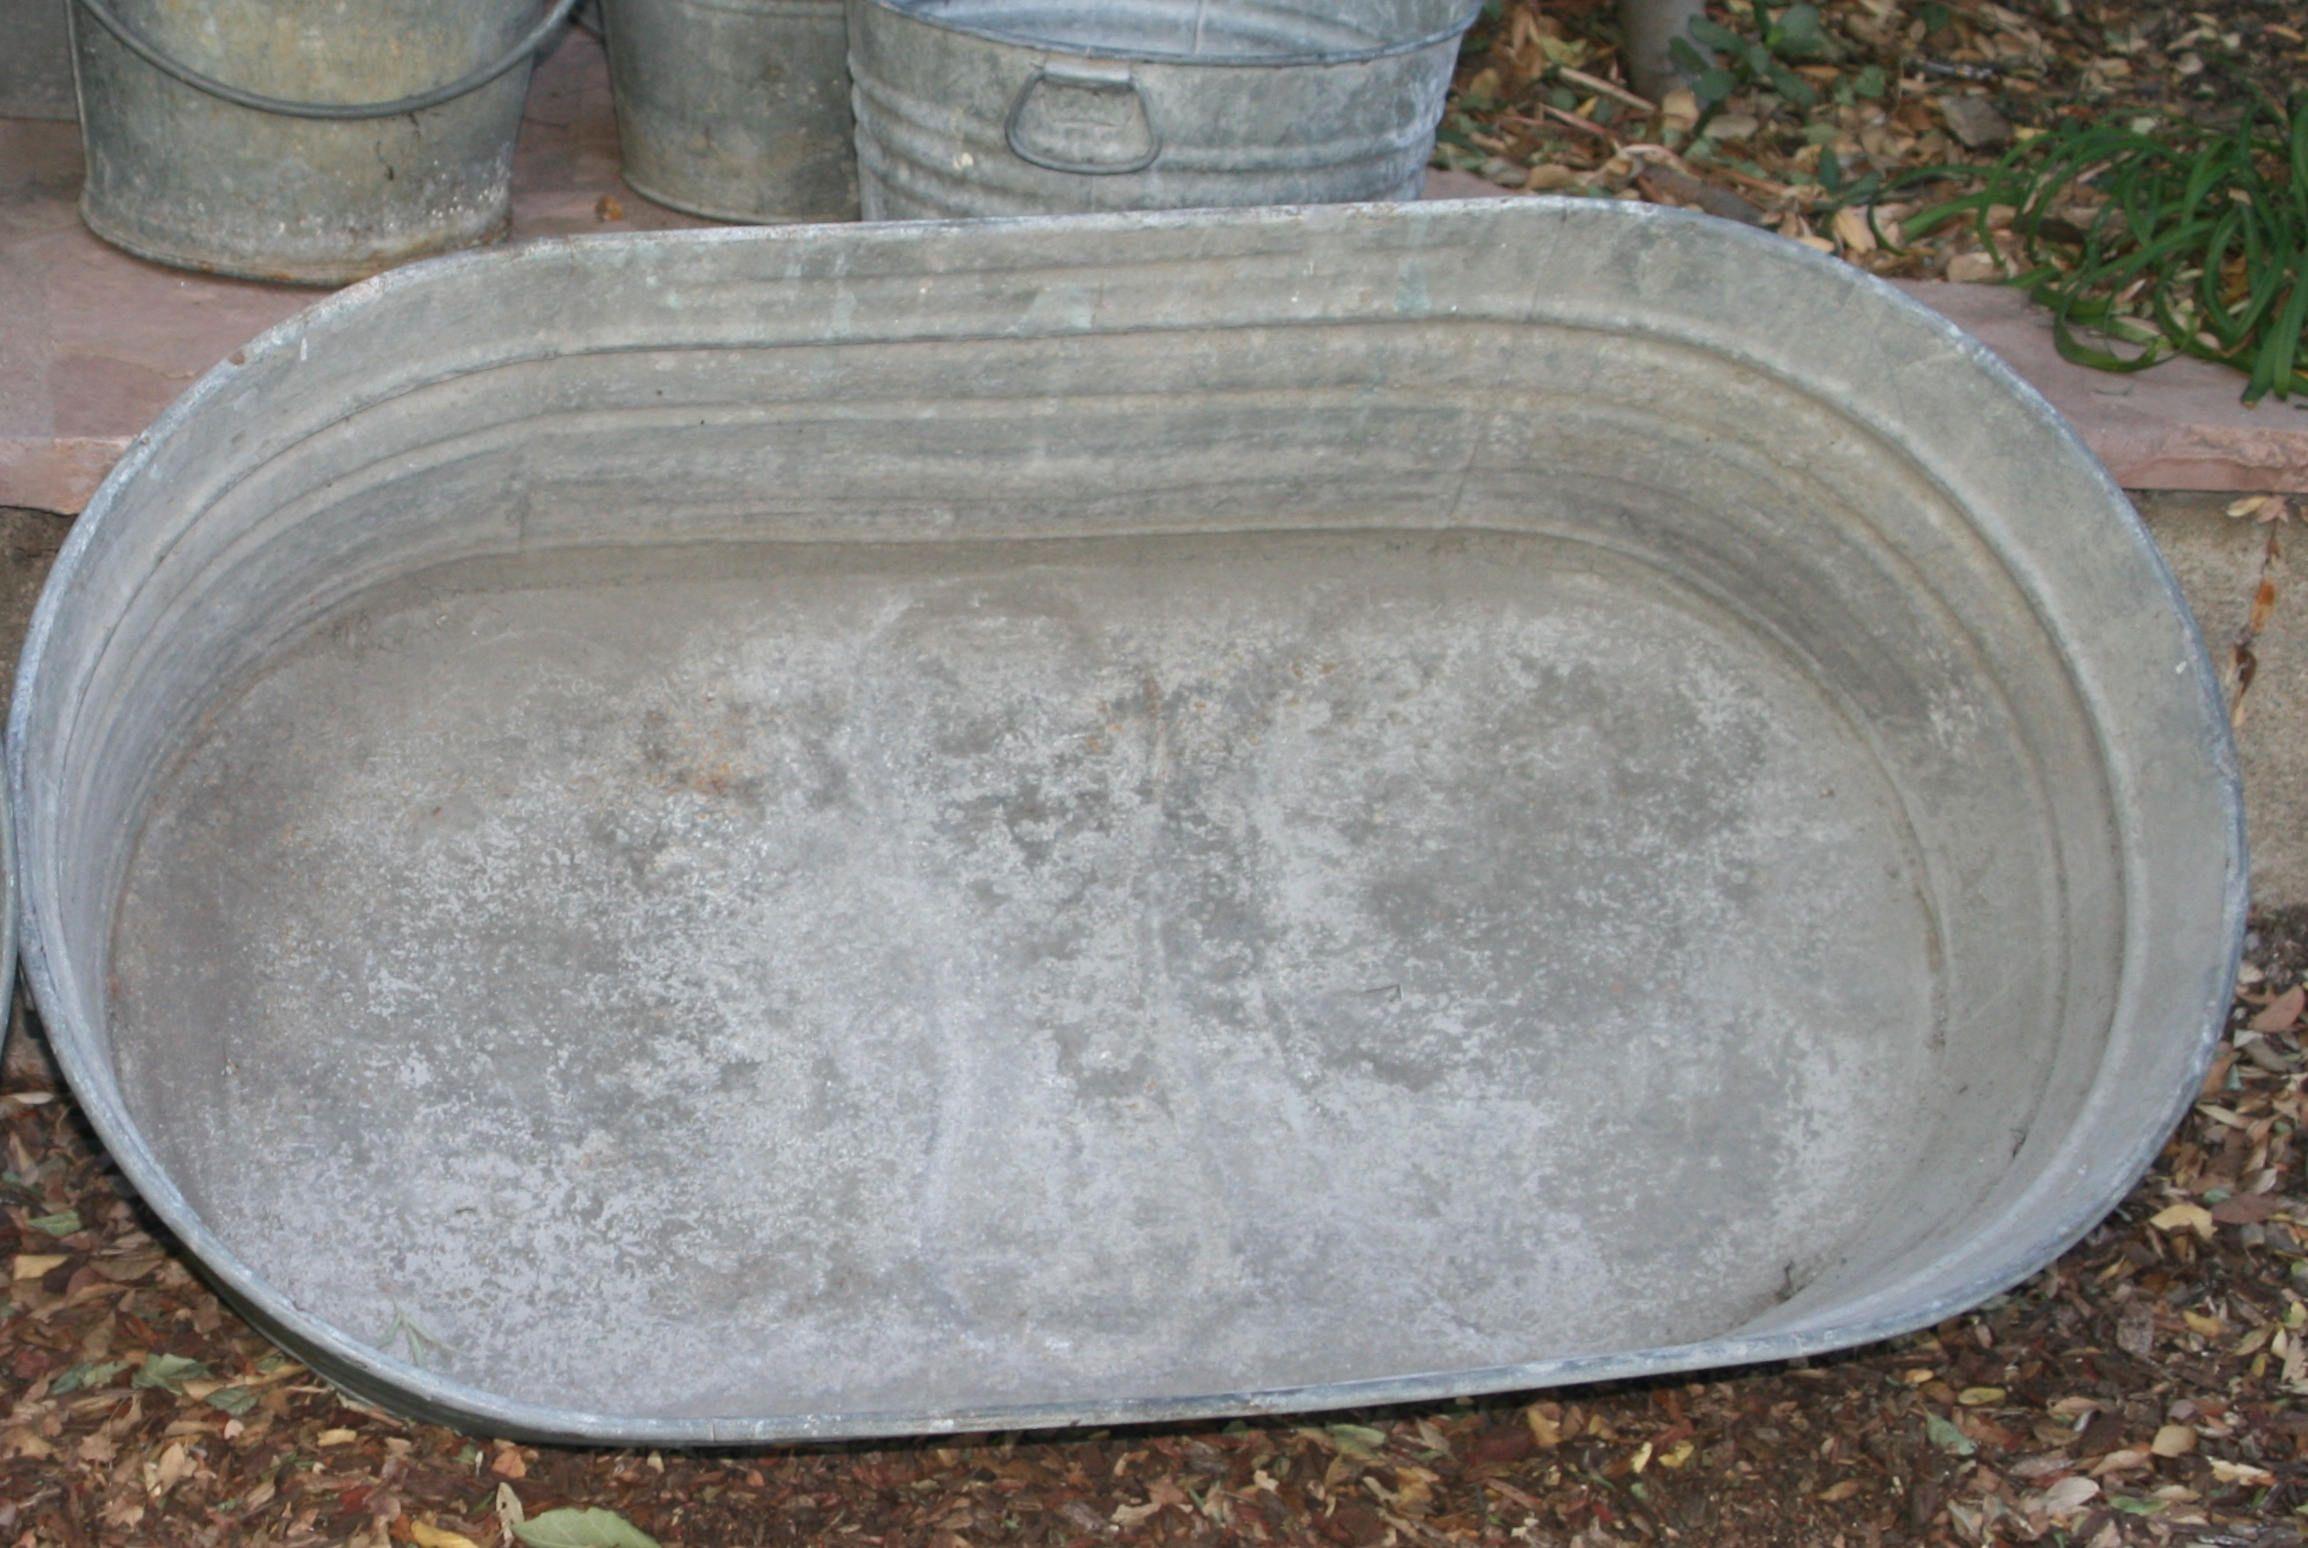 Large Vintage Oval Galvanized Tub Trough Cowboy Bath By Theoldgreengarage On Etsy Galvanized Tub Galvanized Vintage